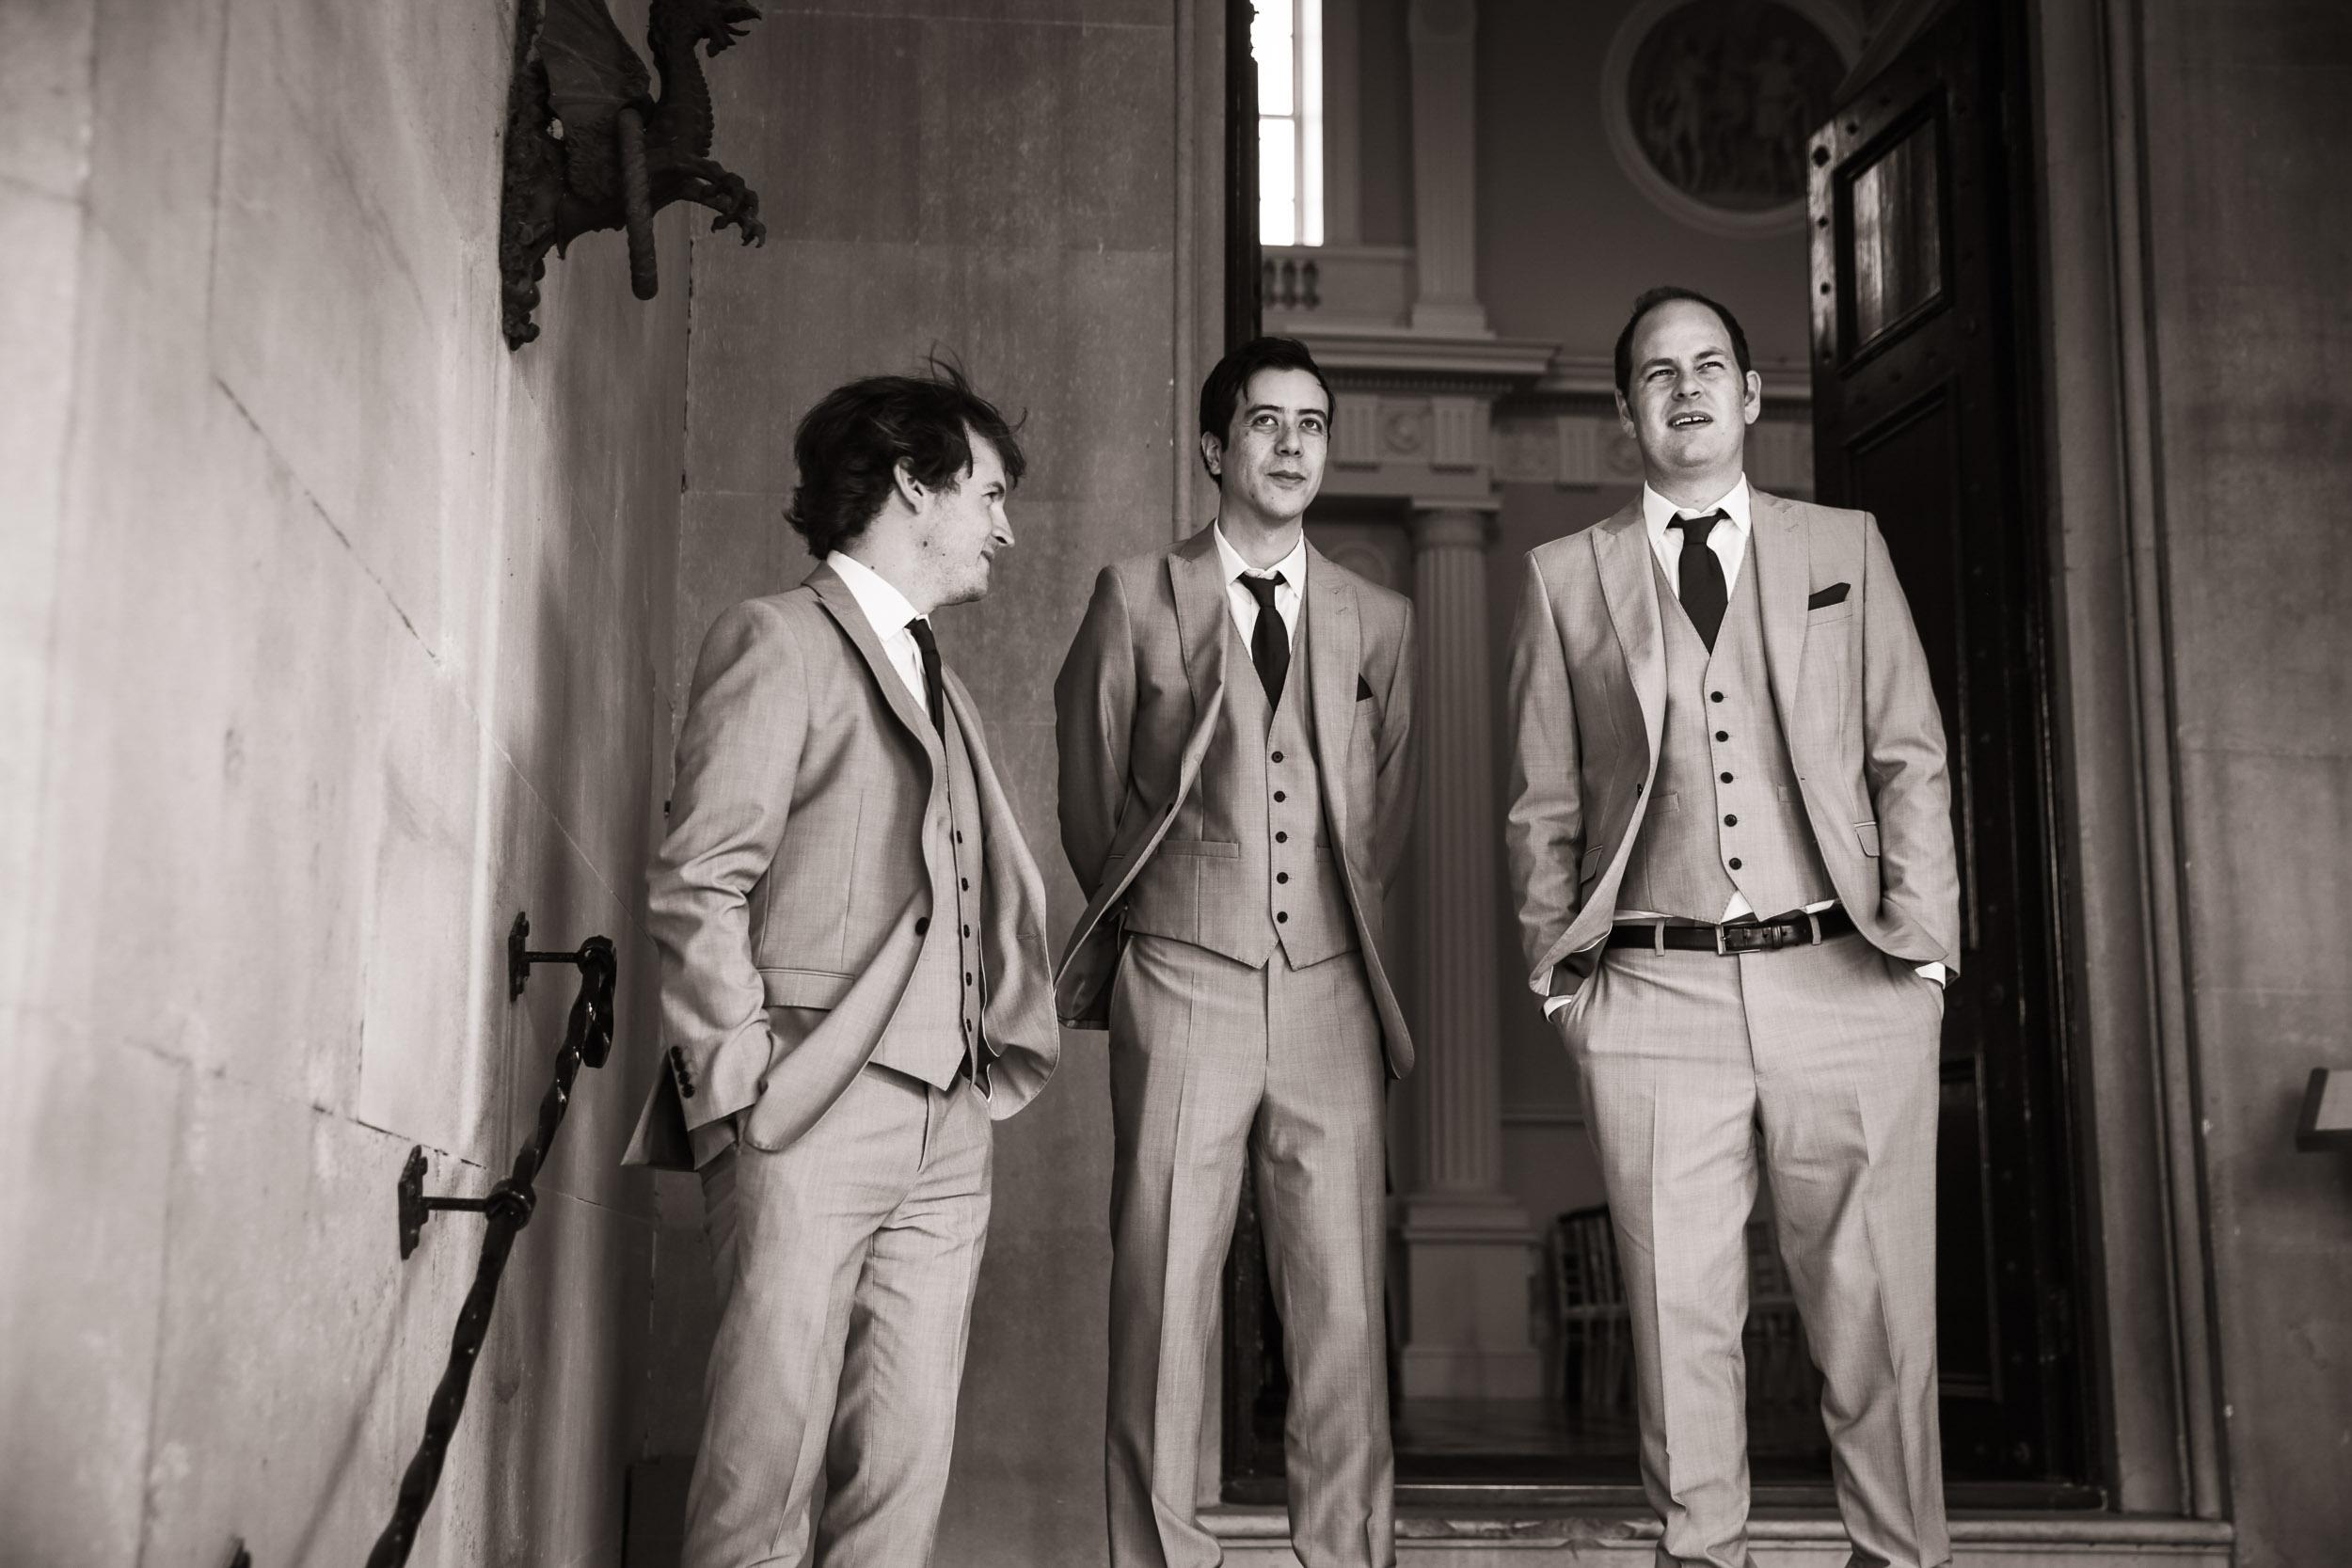 syon-house-wedding-photographer-london 020.jpg